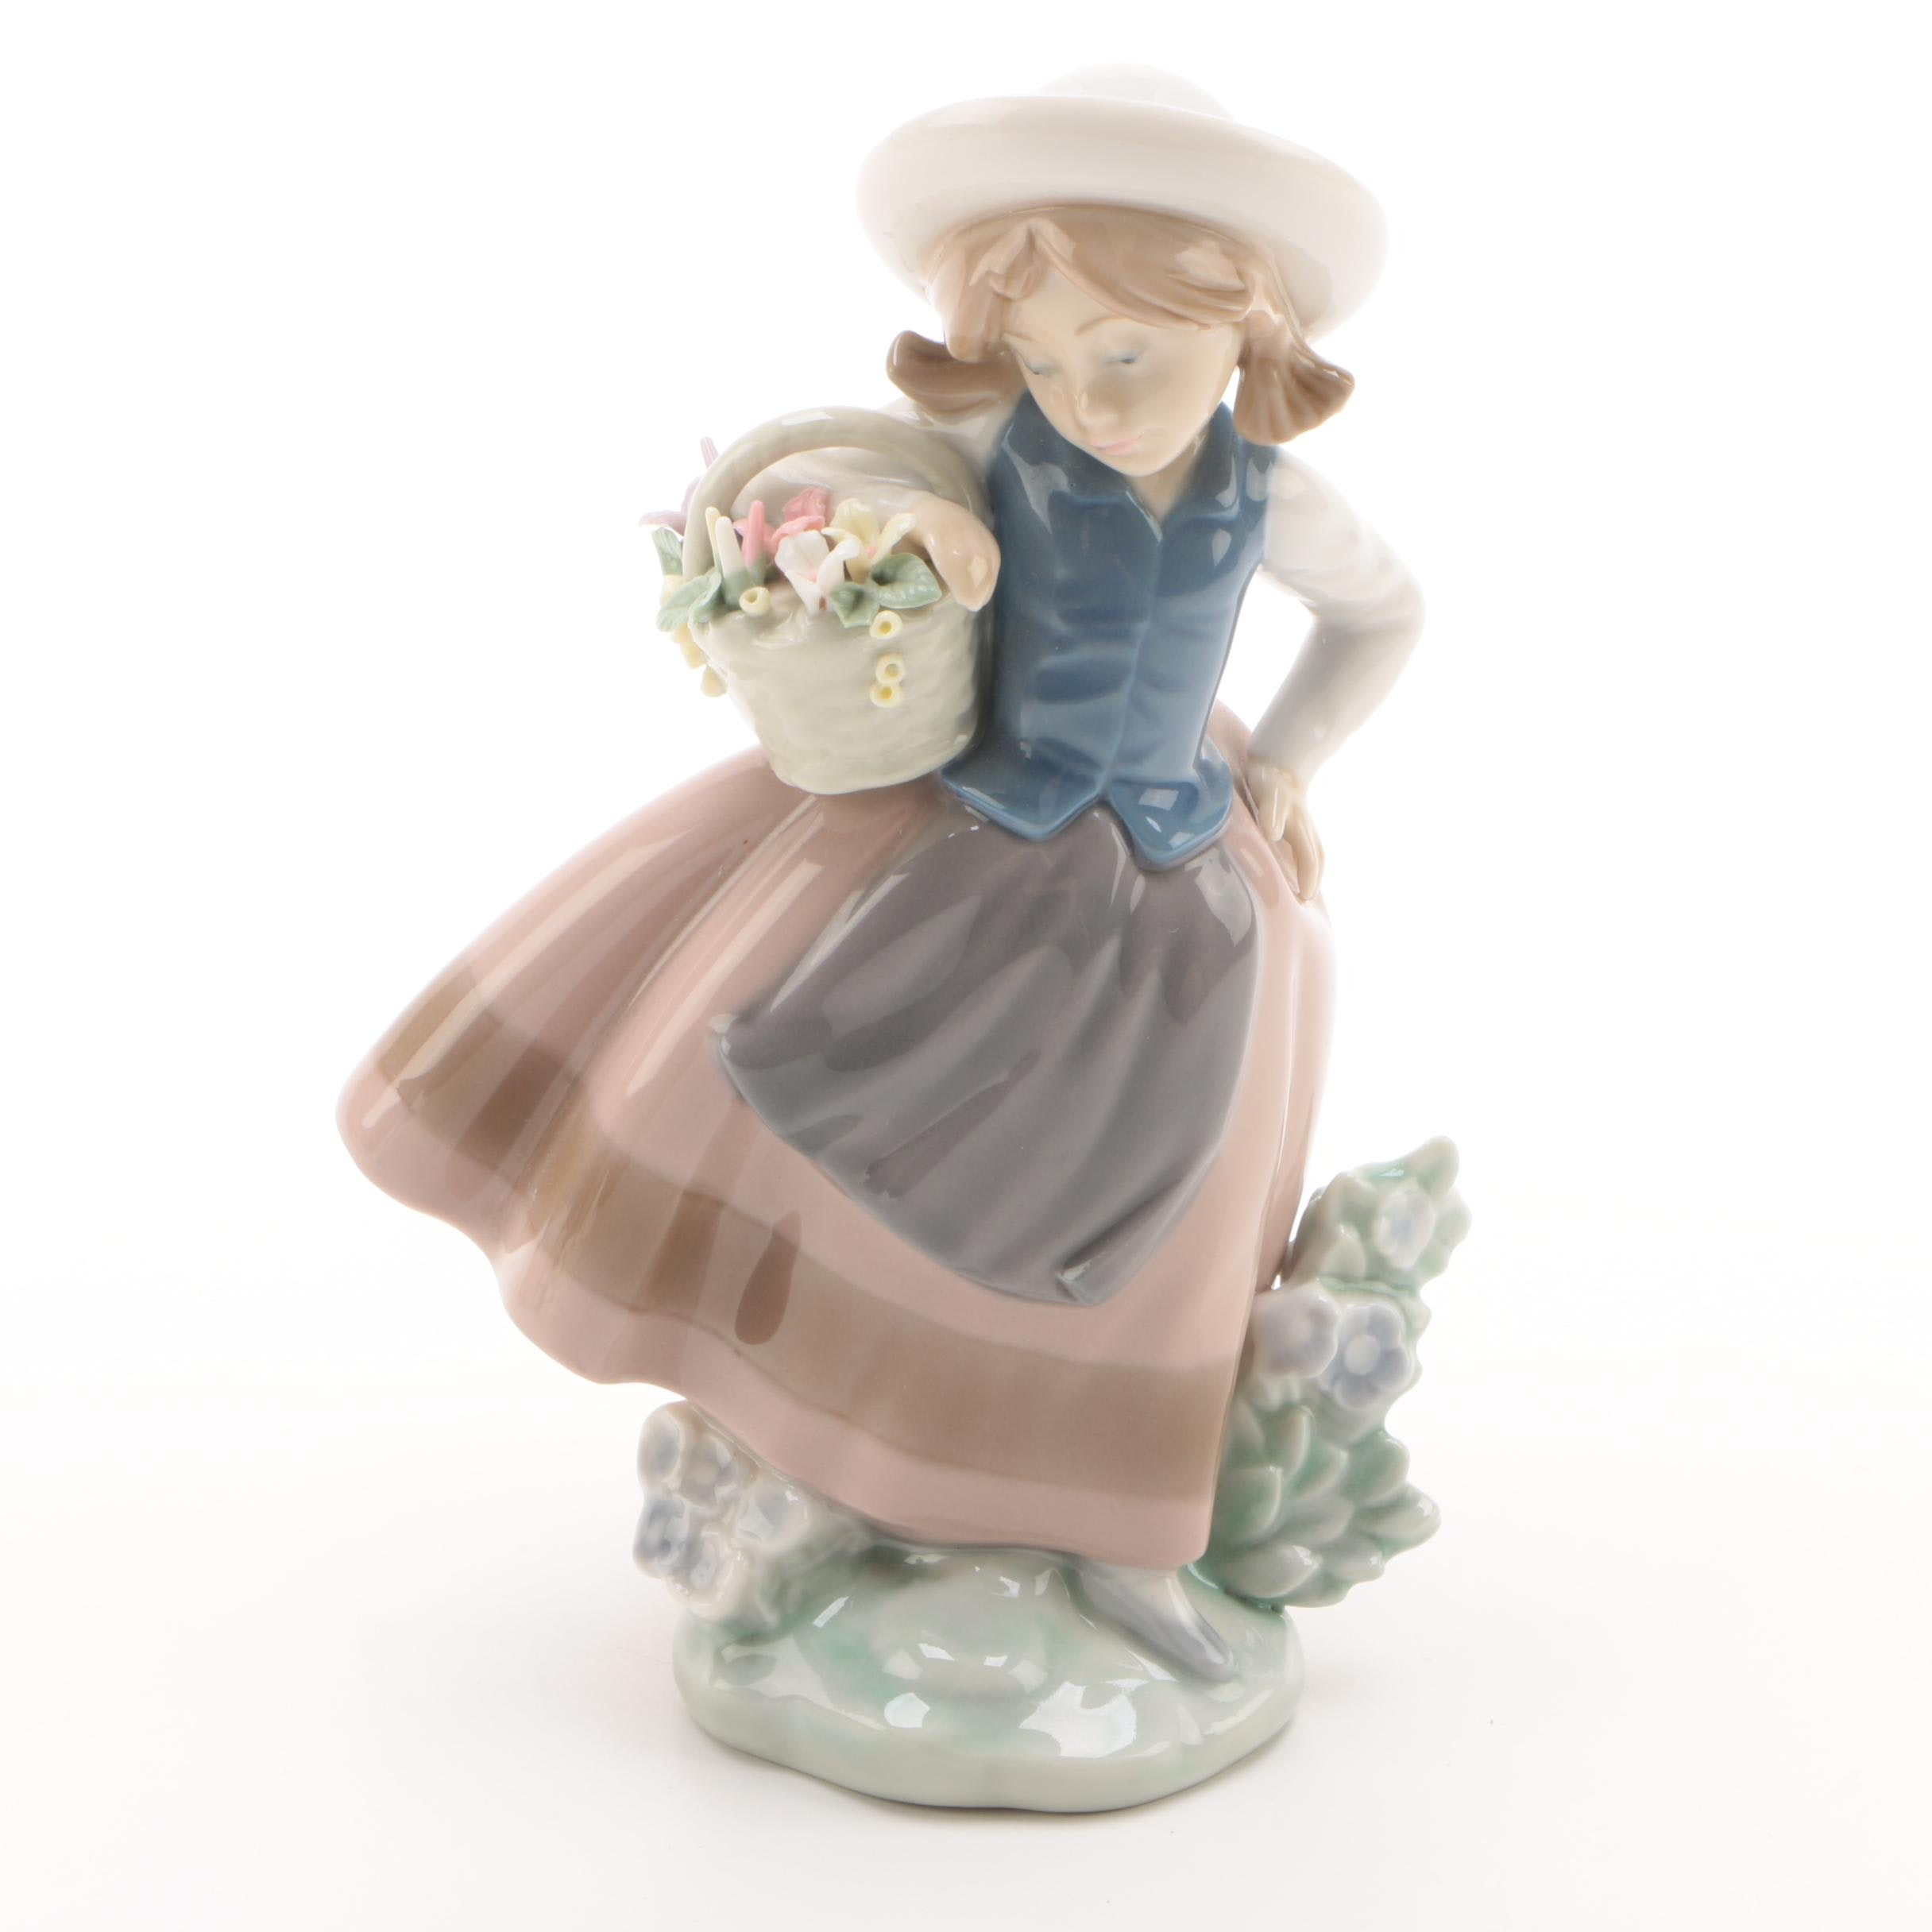 "Lladró Hand-Painted Porcelain Figurine ""Sweet Scent"""